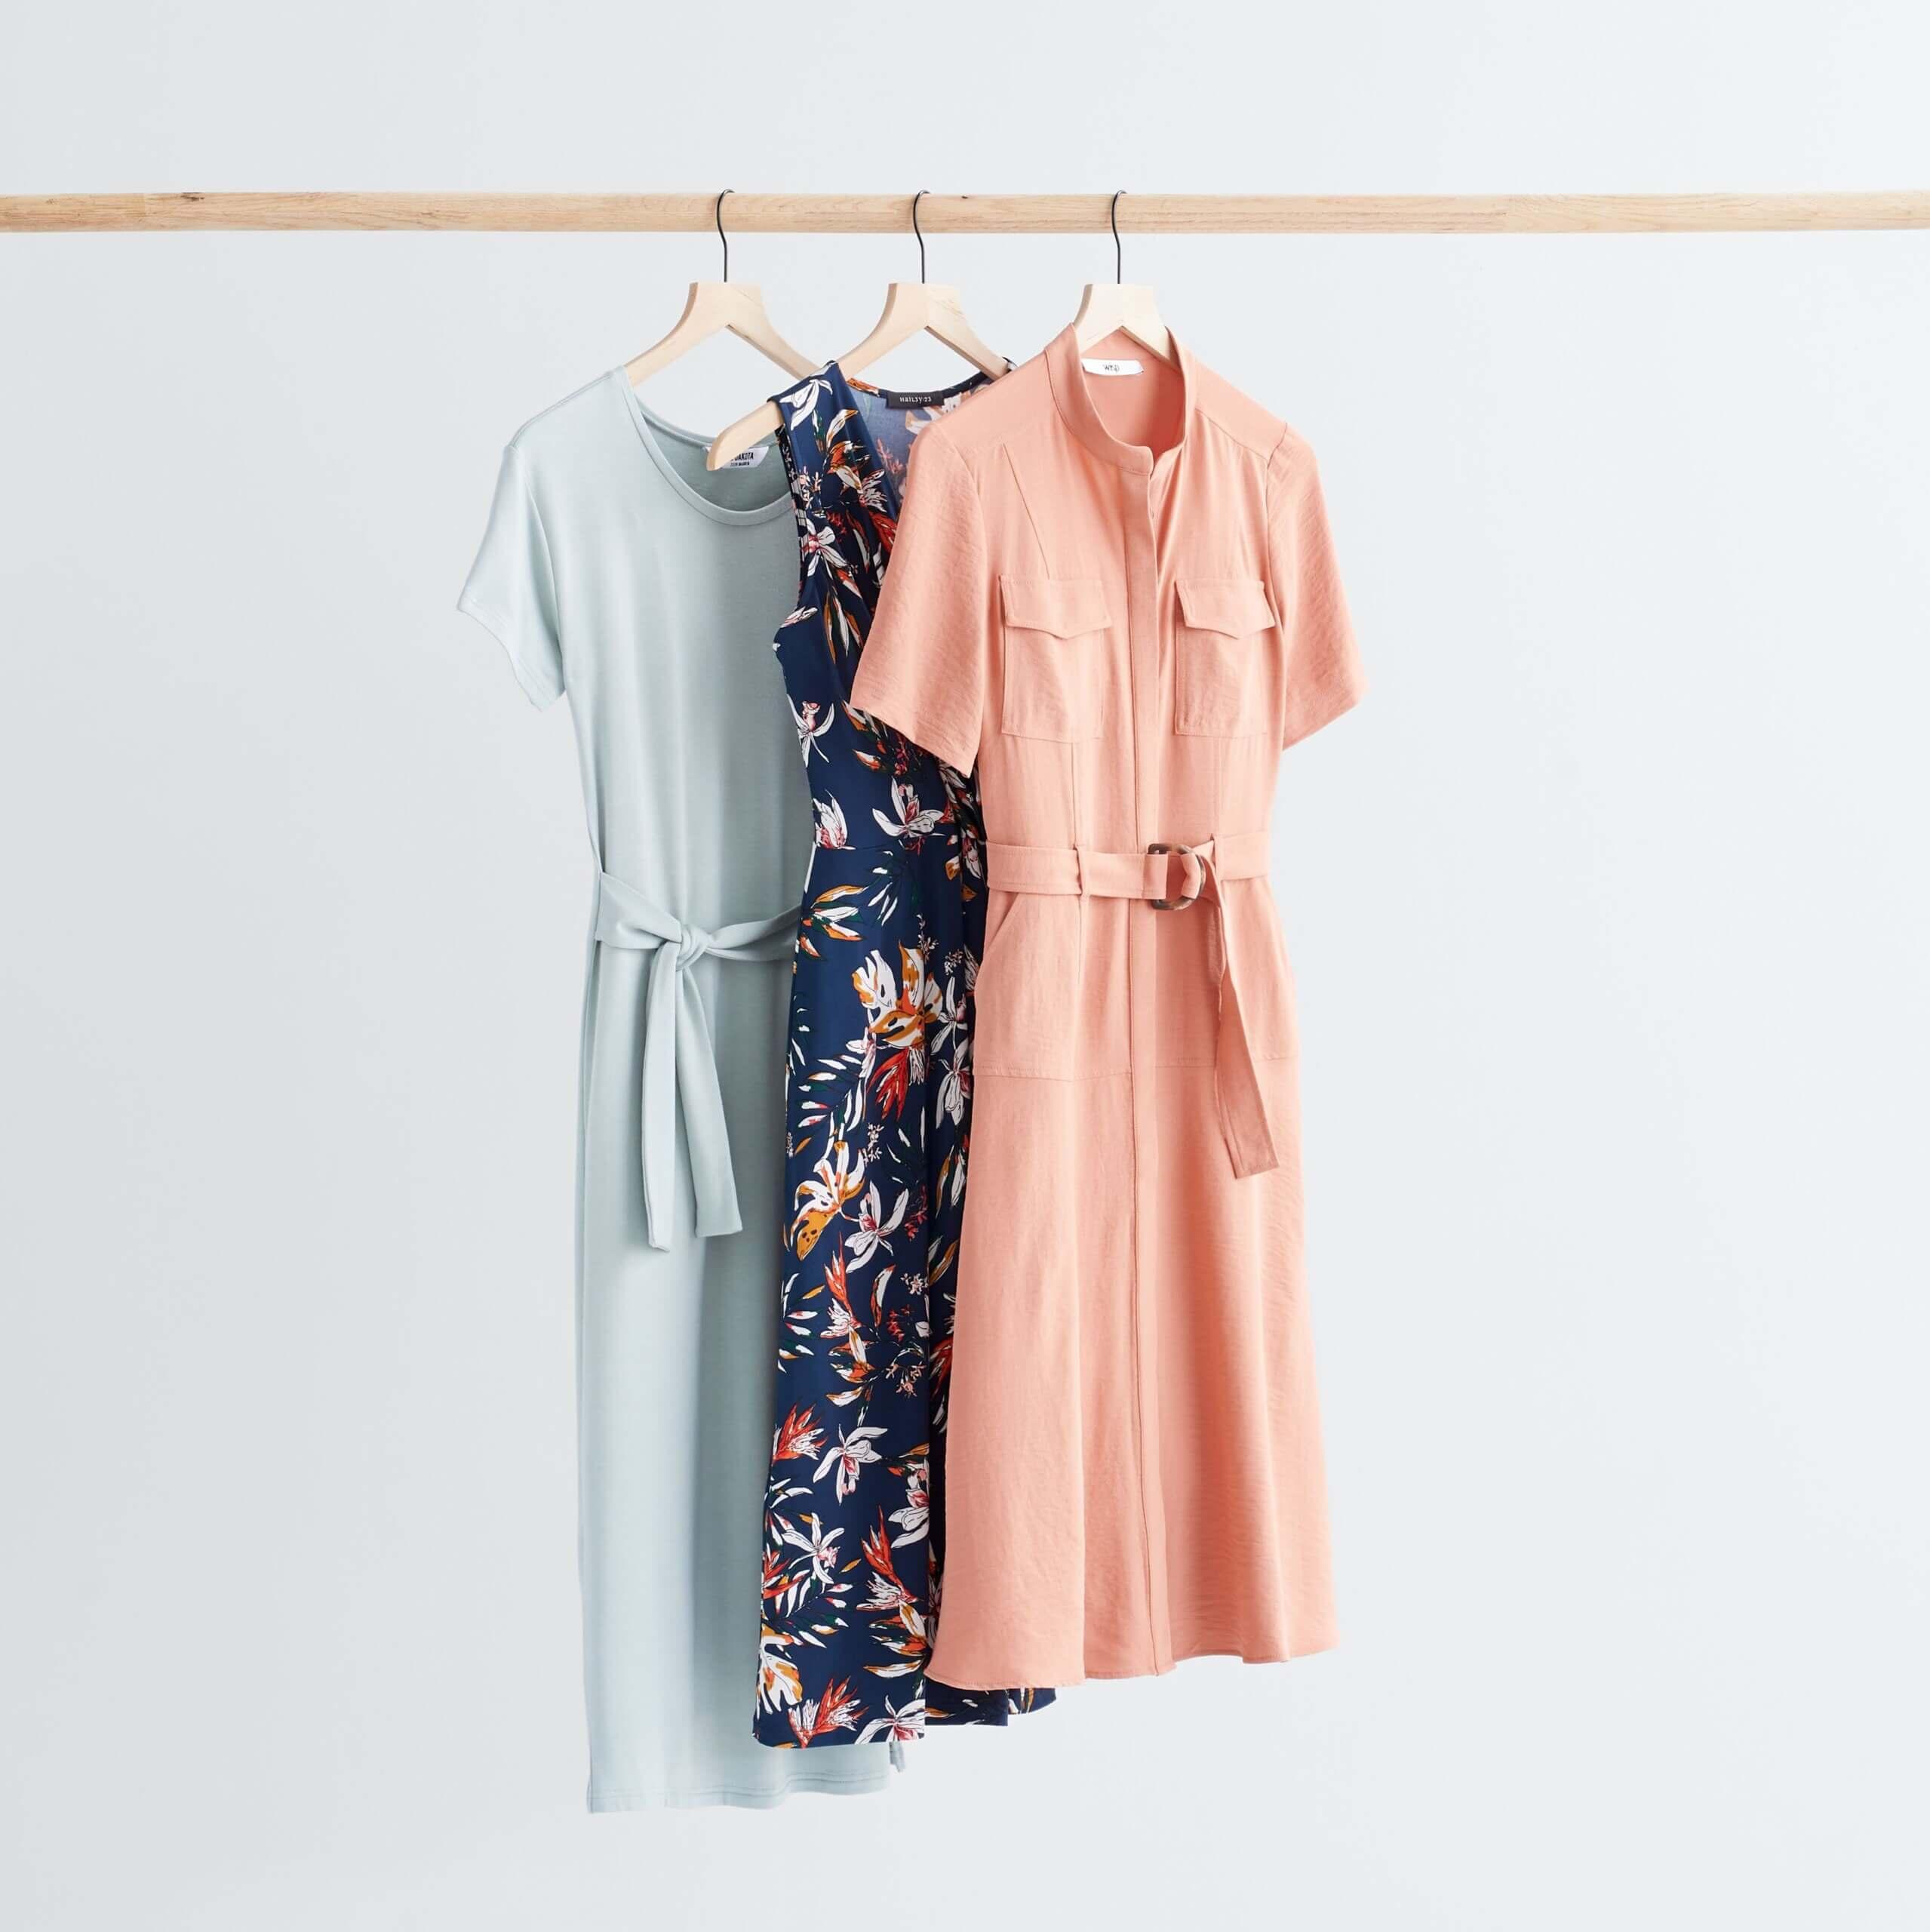 Stitch Fix Women's rack image featuring pink shirt dress, navy floral dress and baby blue tie-waist dress hanging on wooden rack.